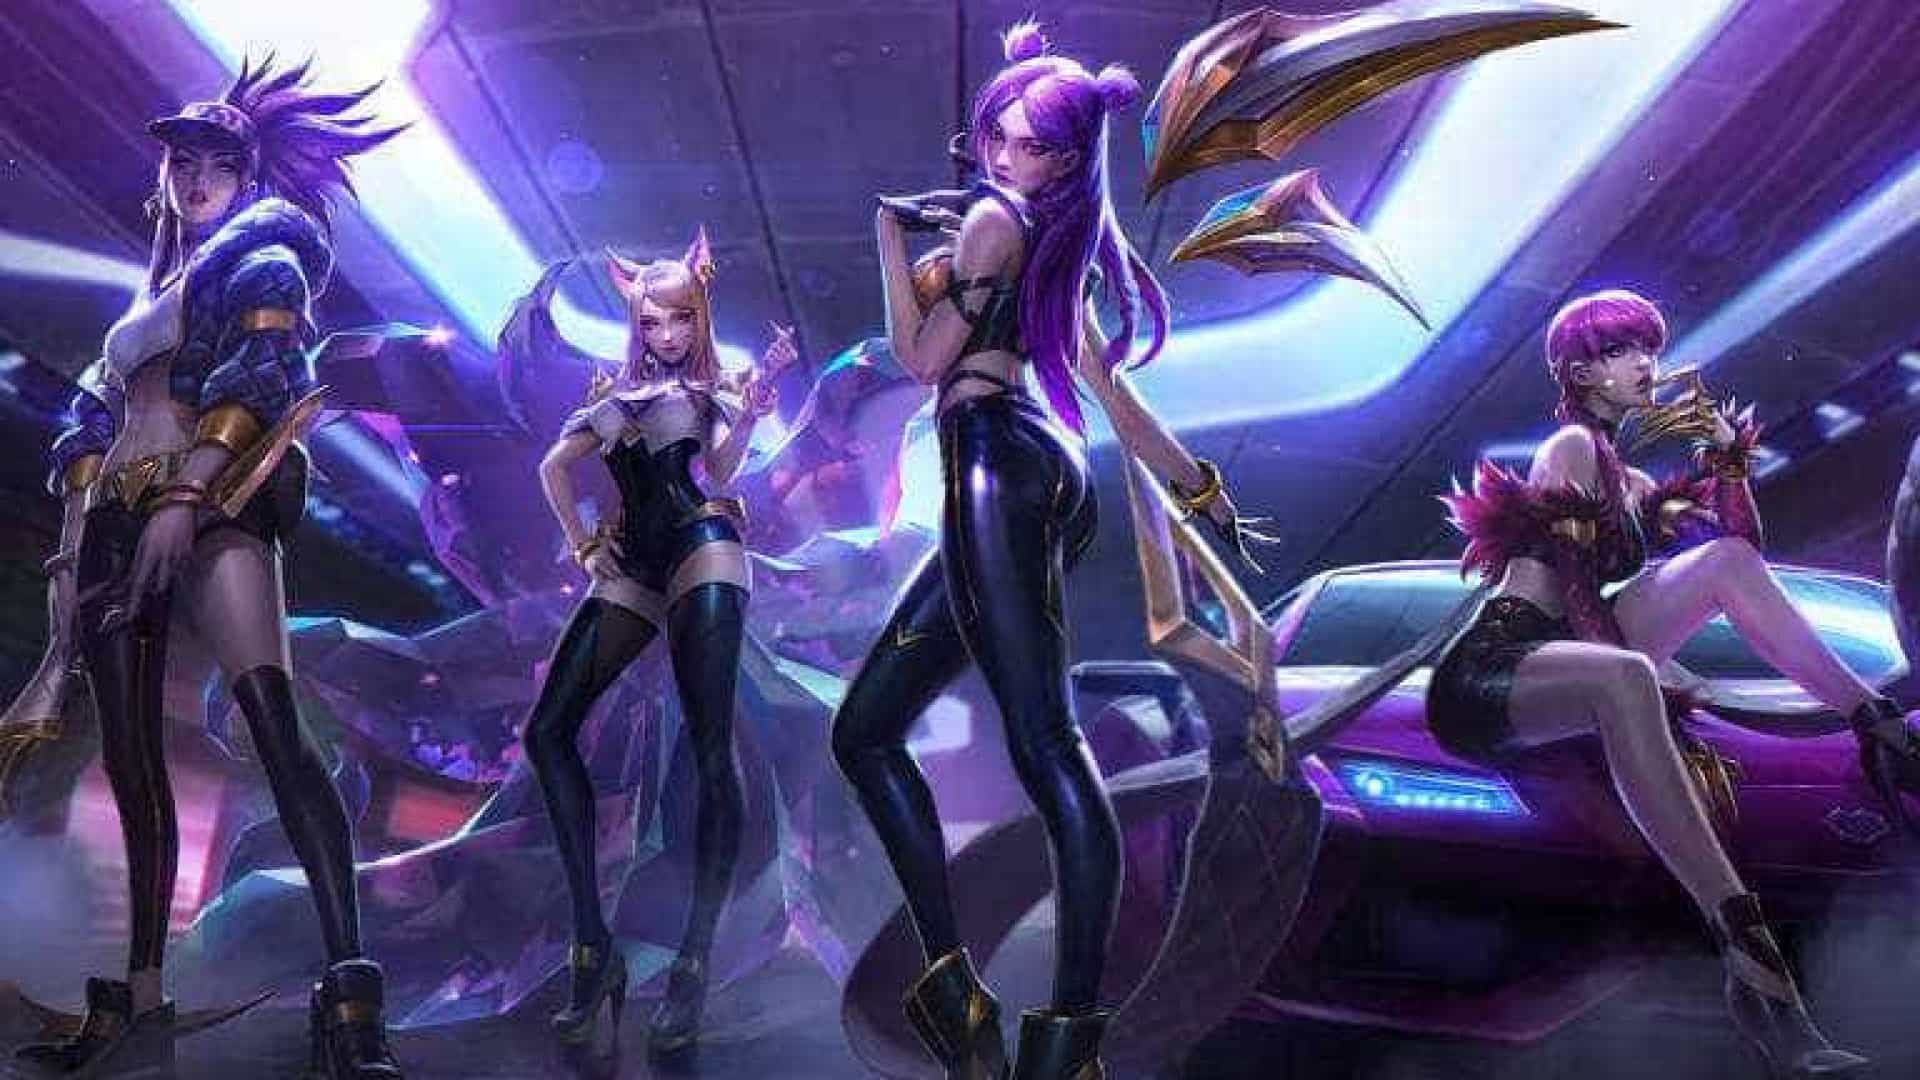 Empresa de jogos cria banda feminina virtual inspirada no k-pop